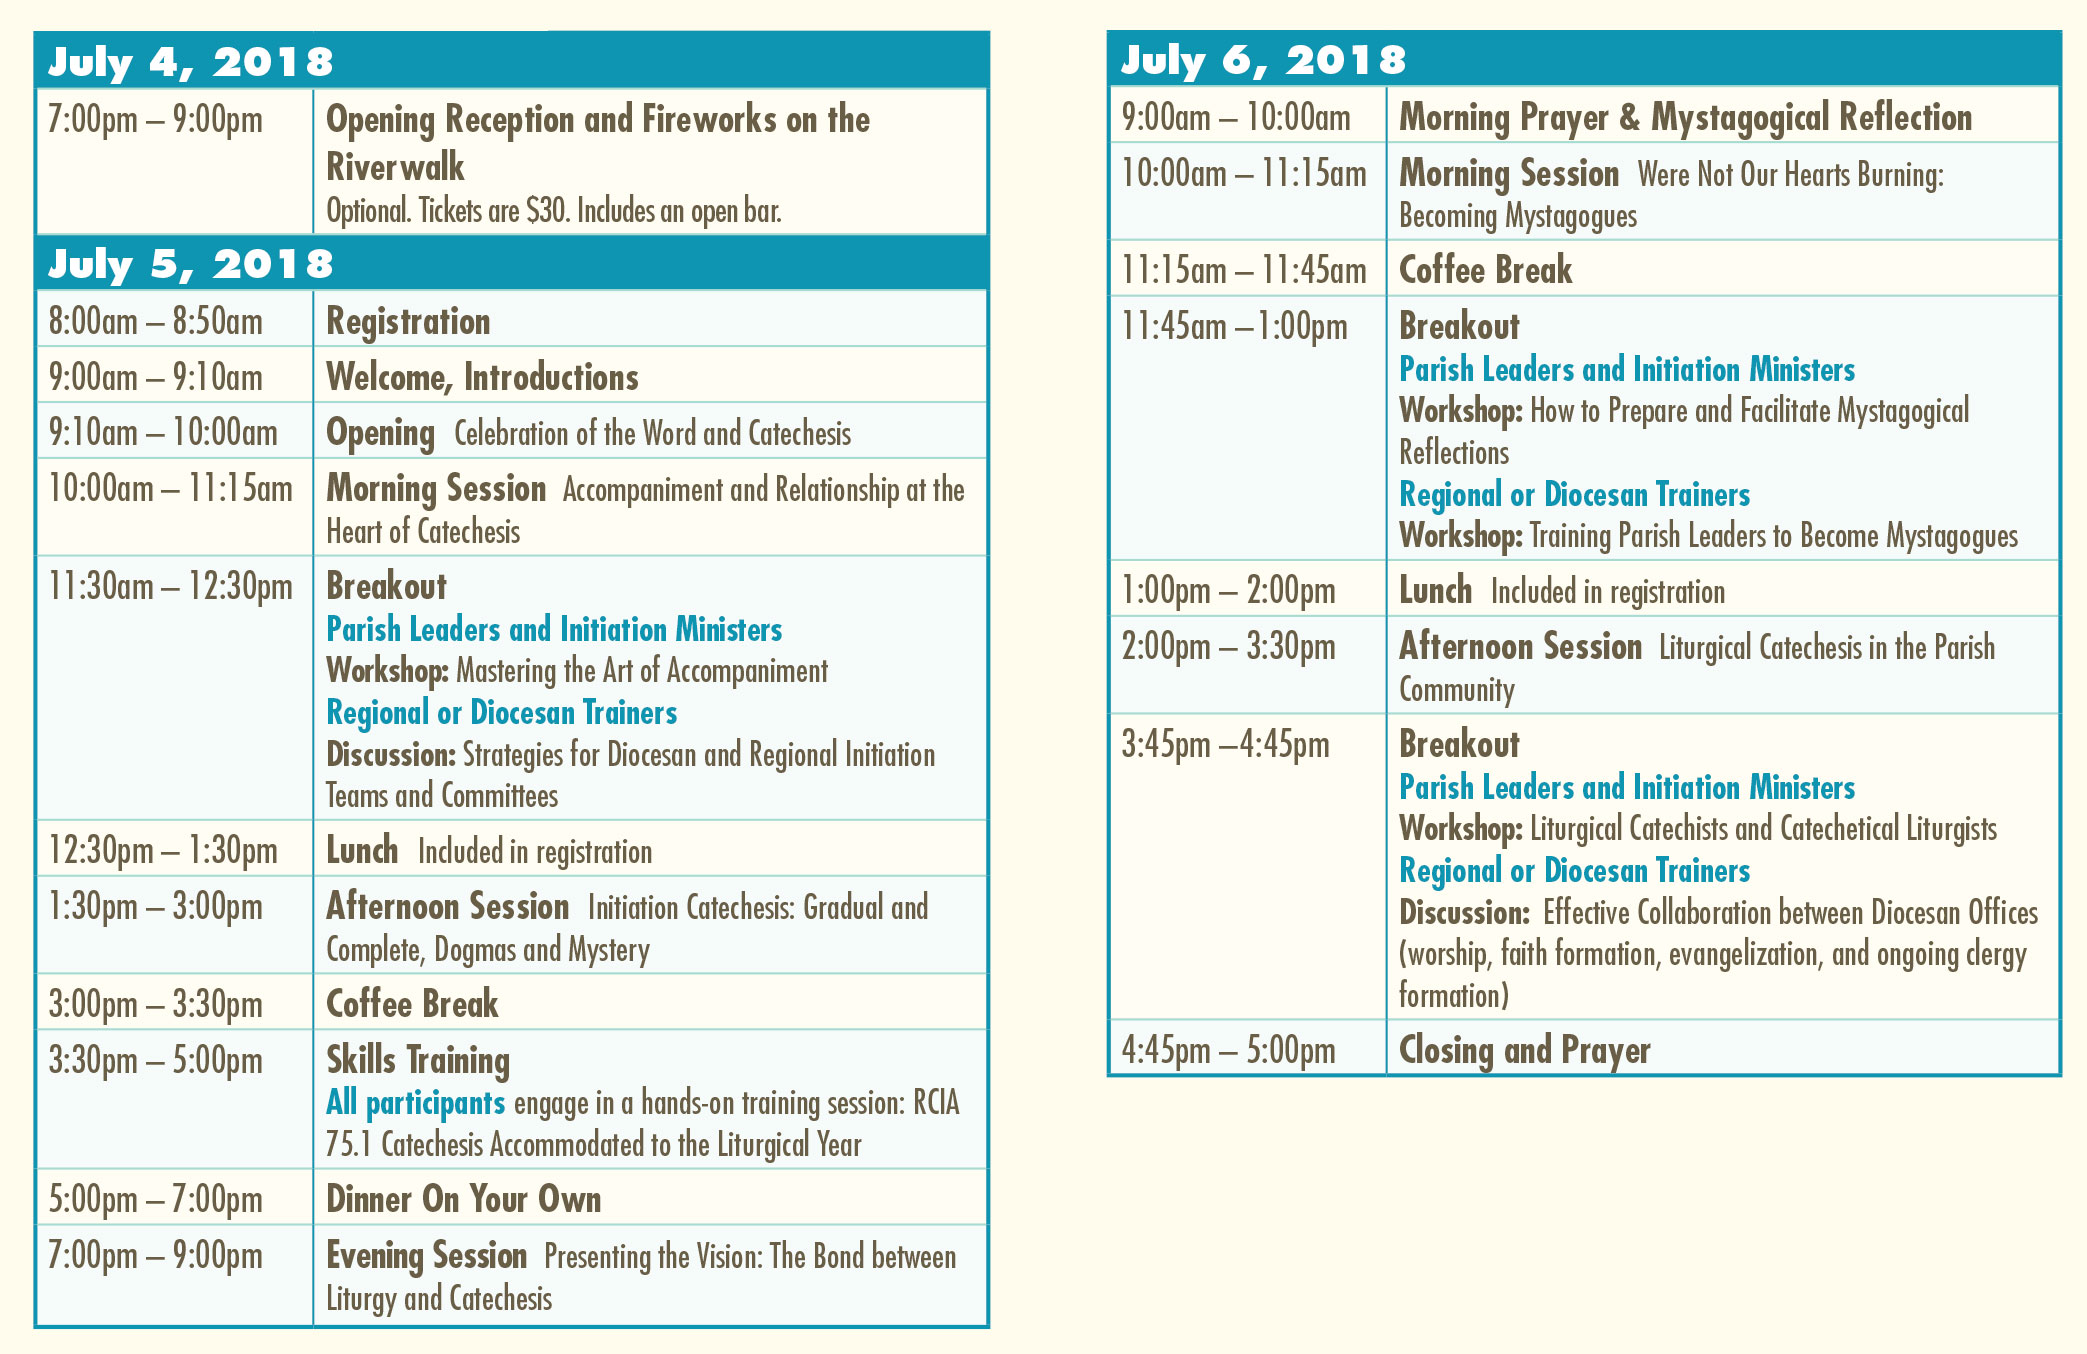 NGCI 2018 Schedule